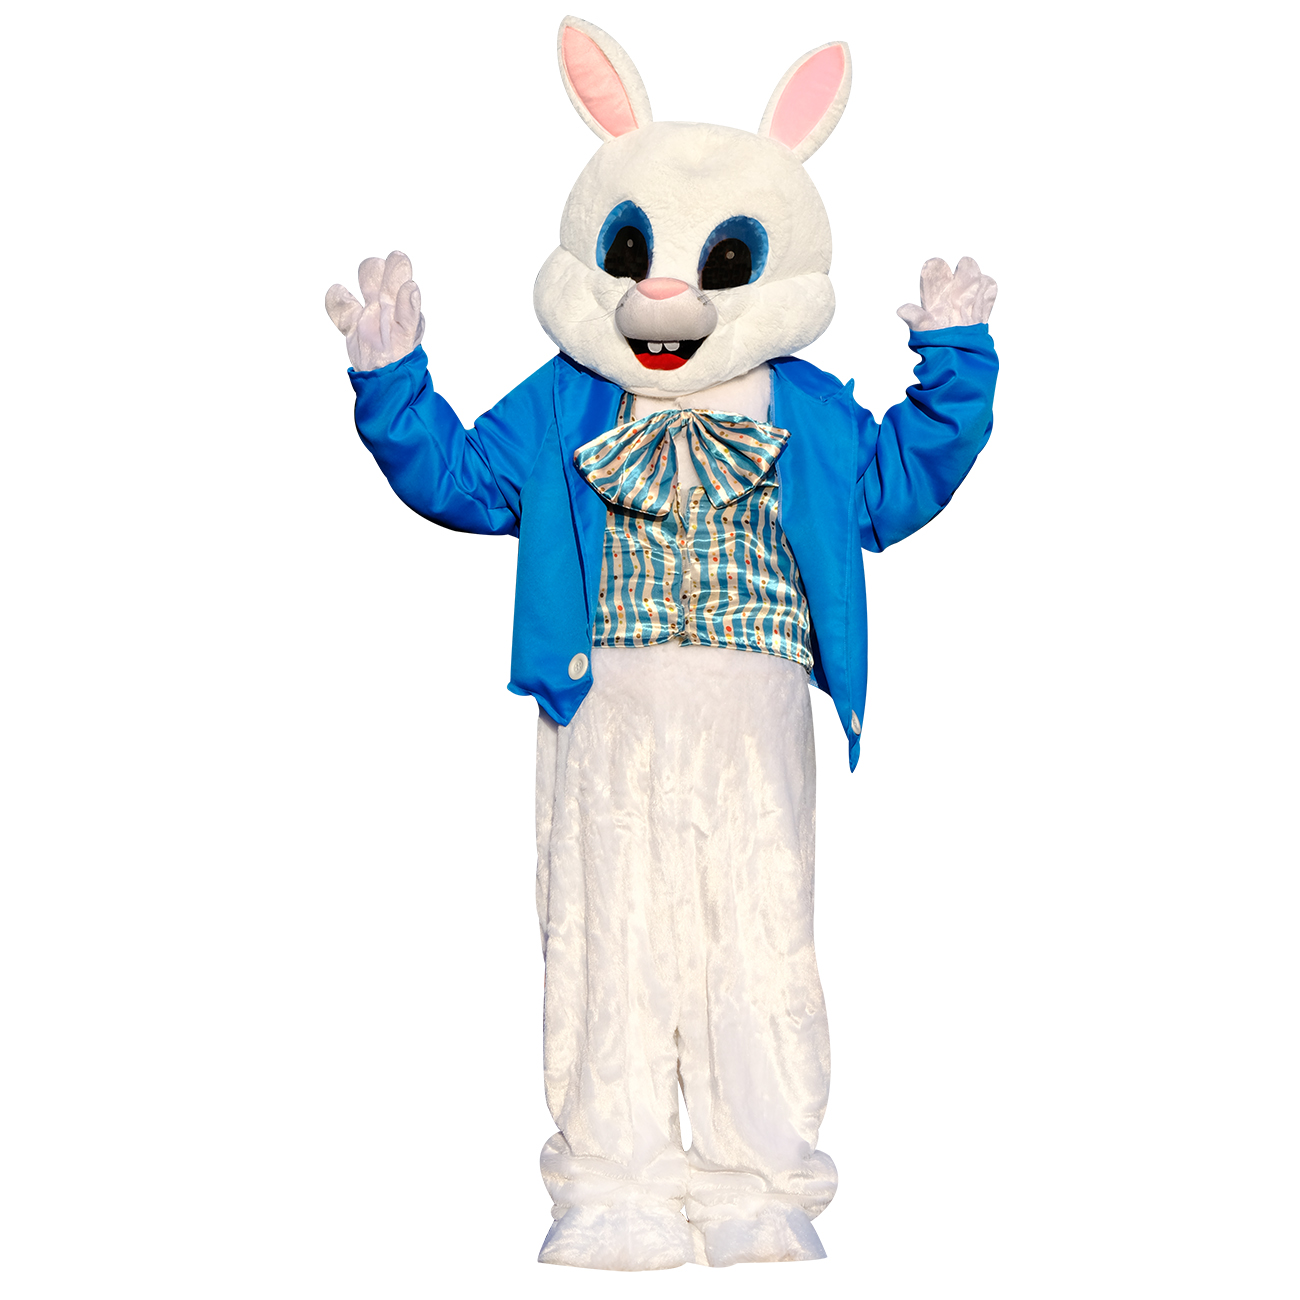 Plush Halloween Easter Bunny Mascot Costume Green Vest  Mask Adult Rabbit